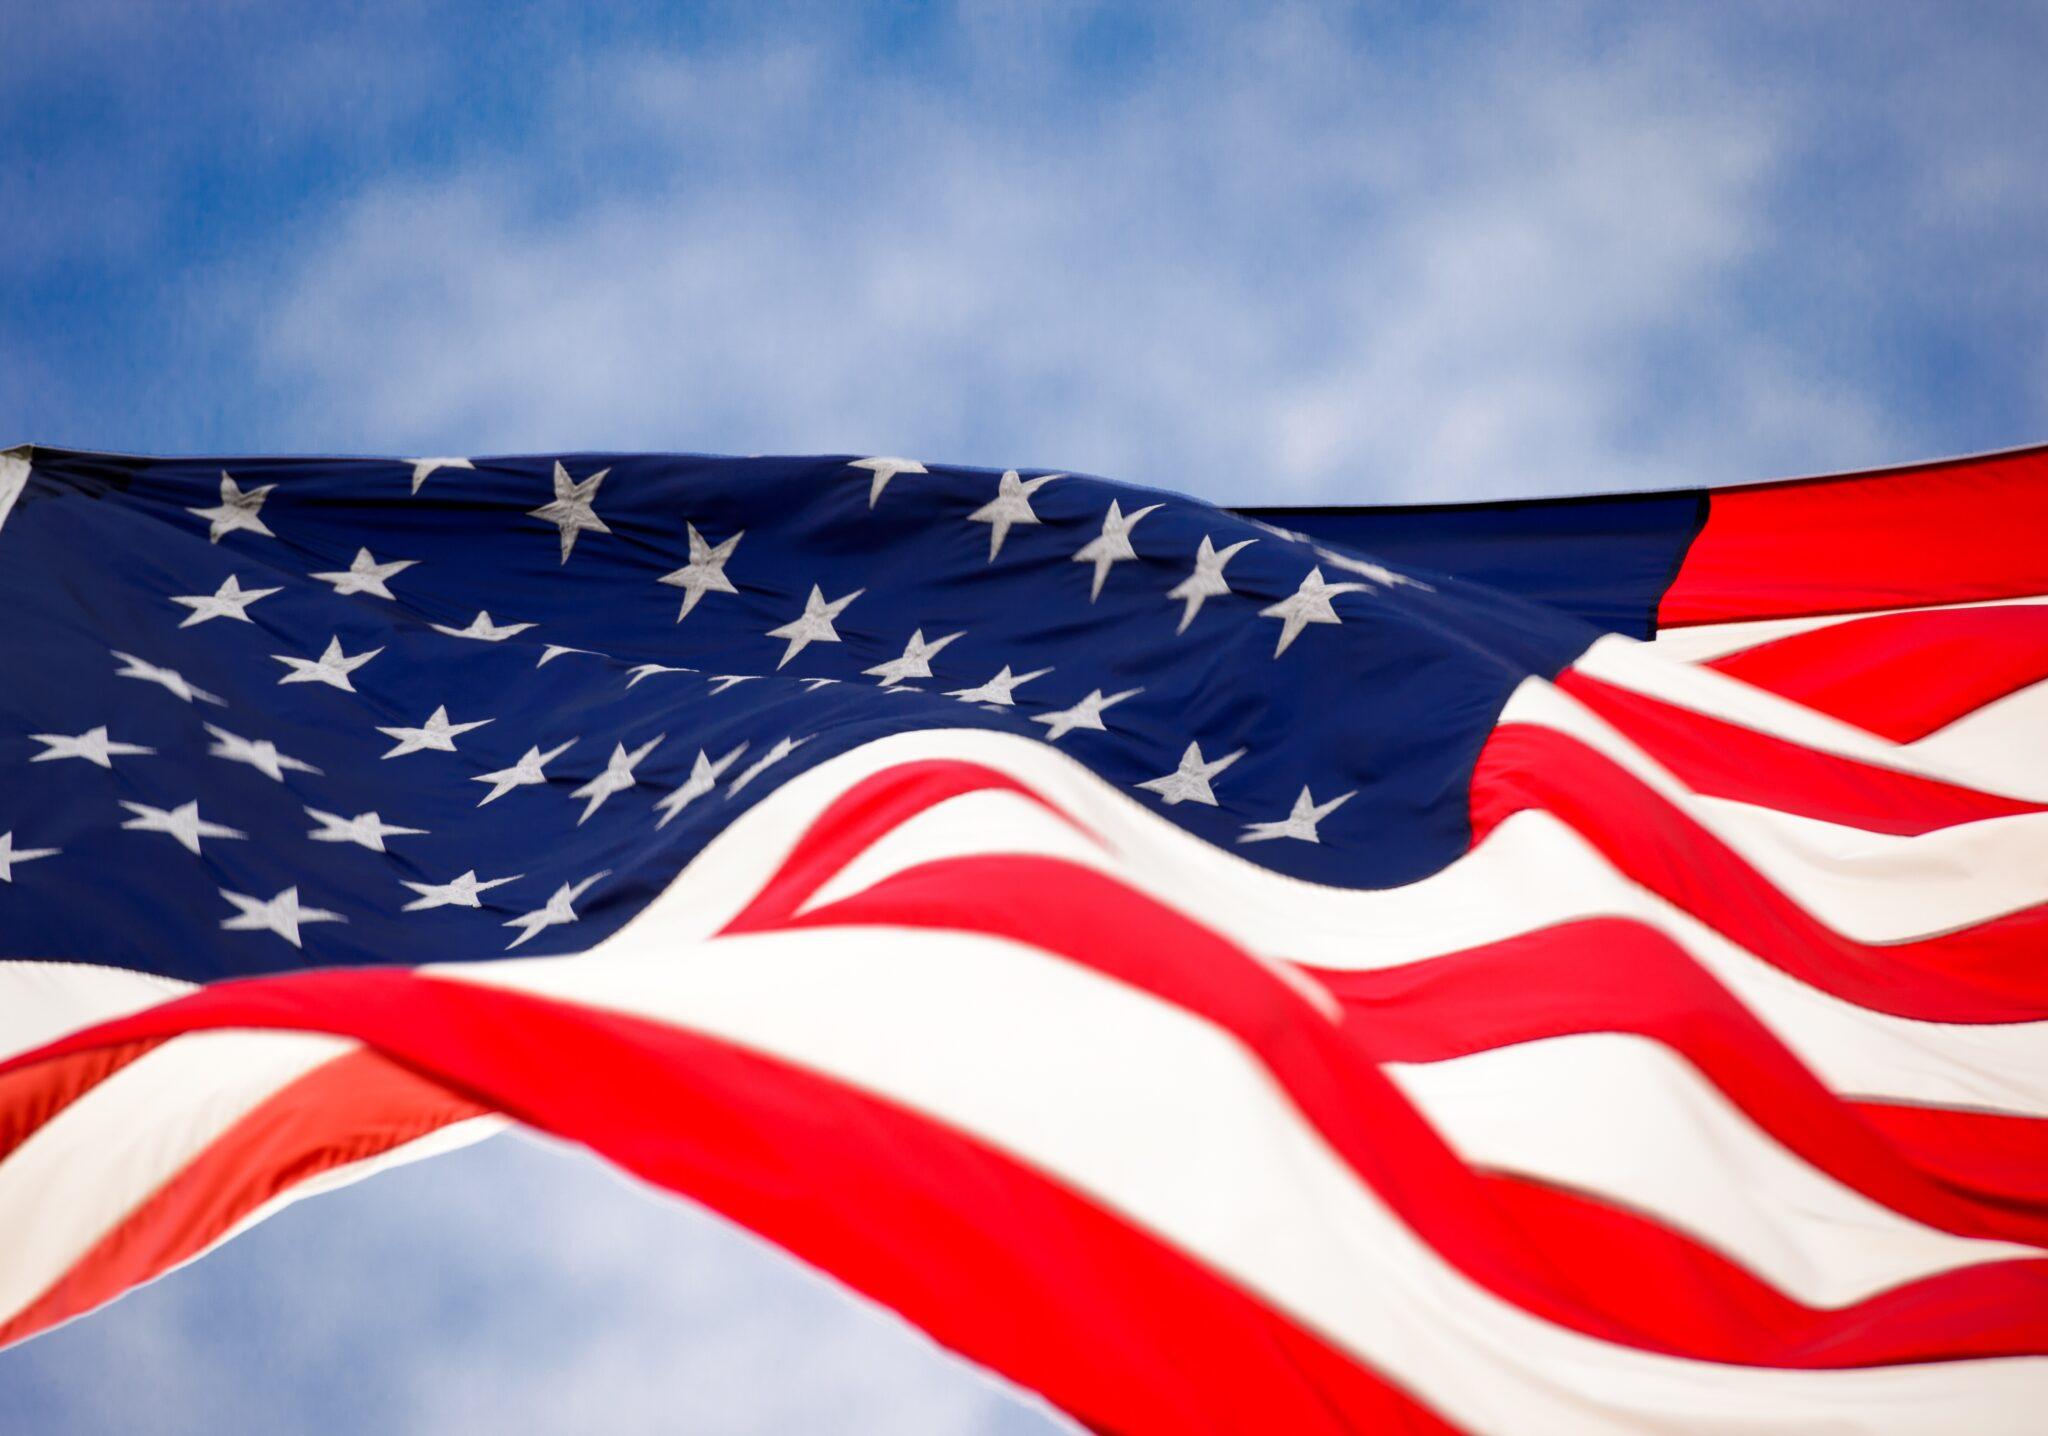 flag, america, usa